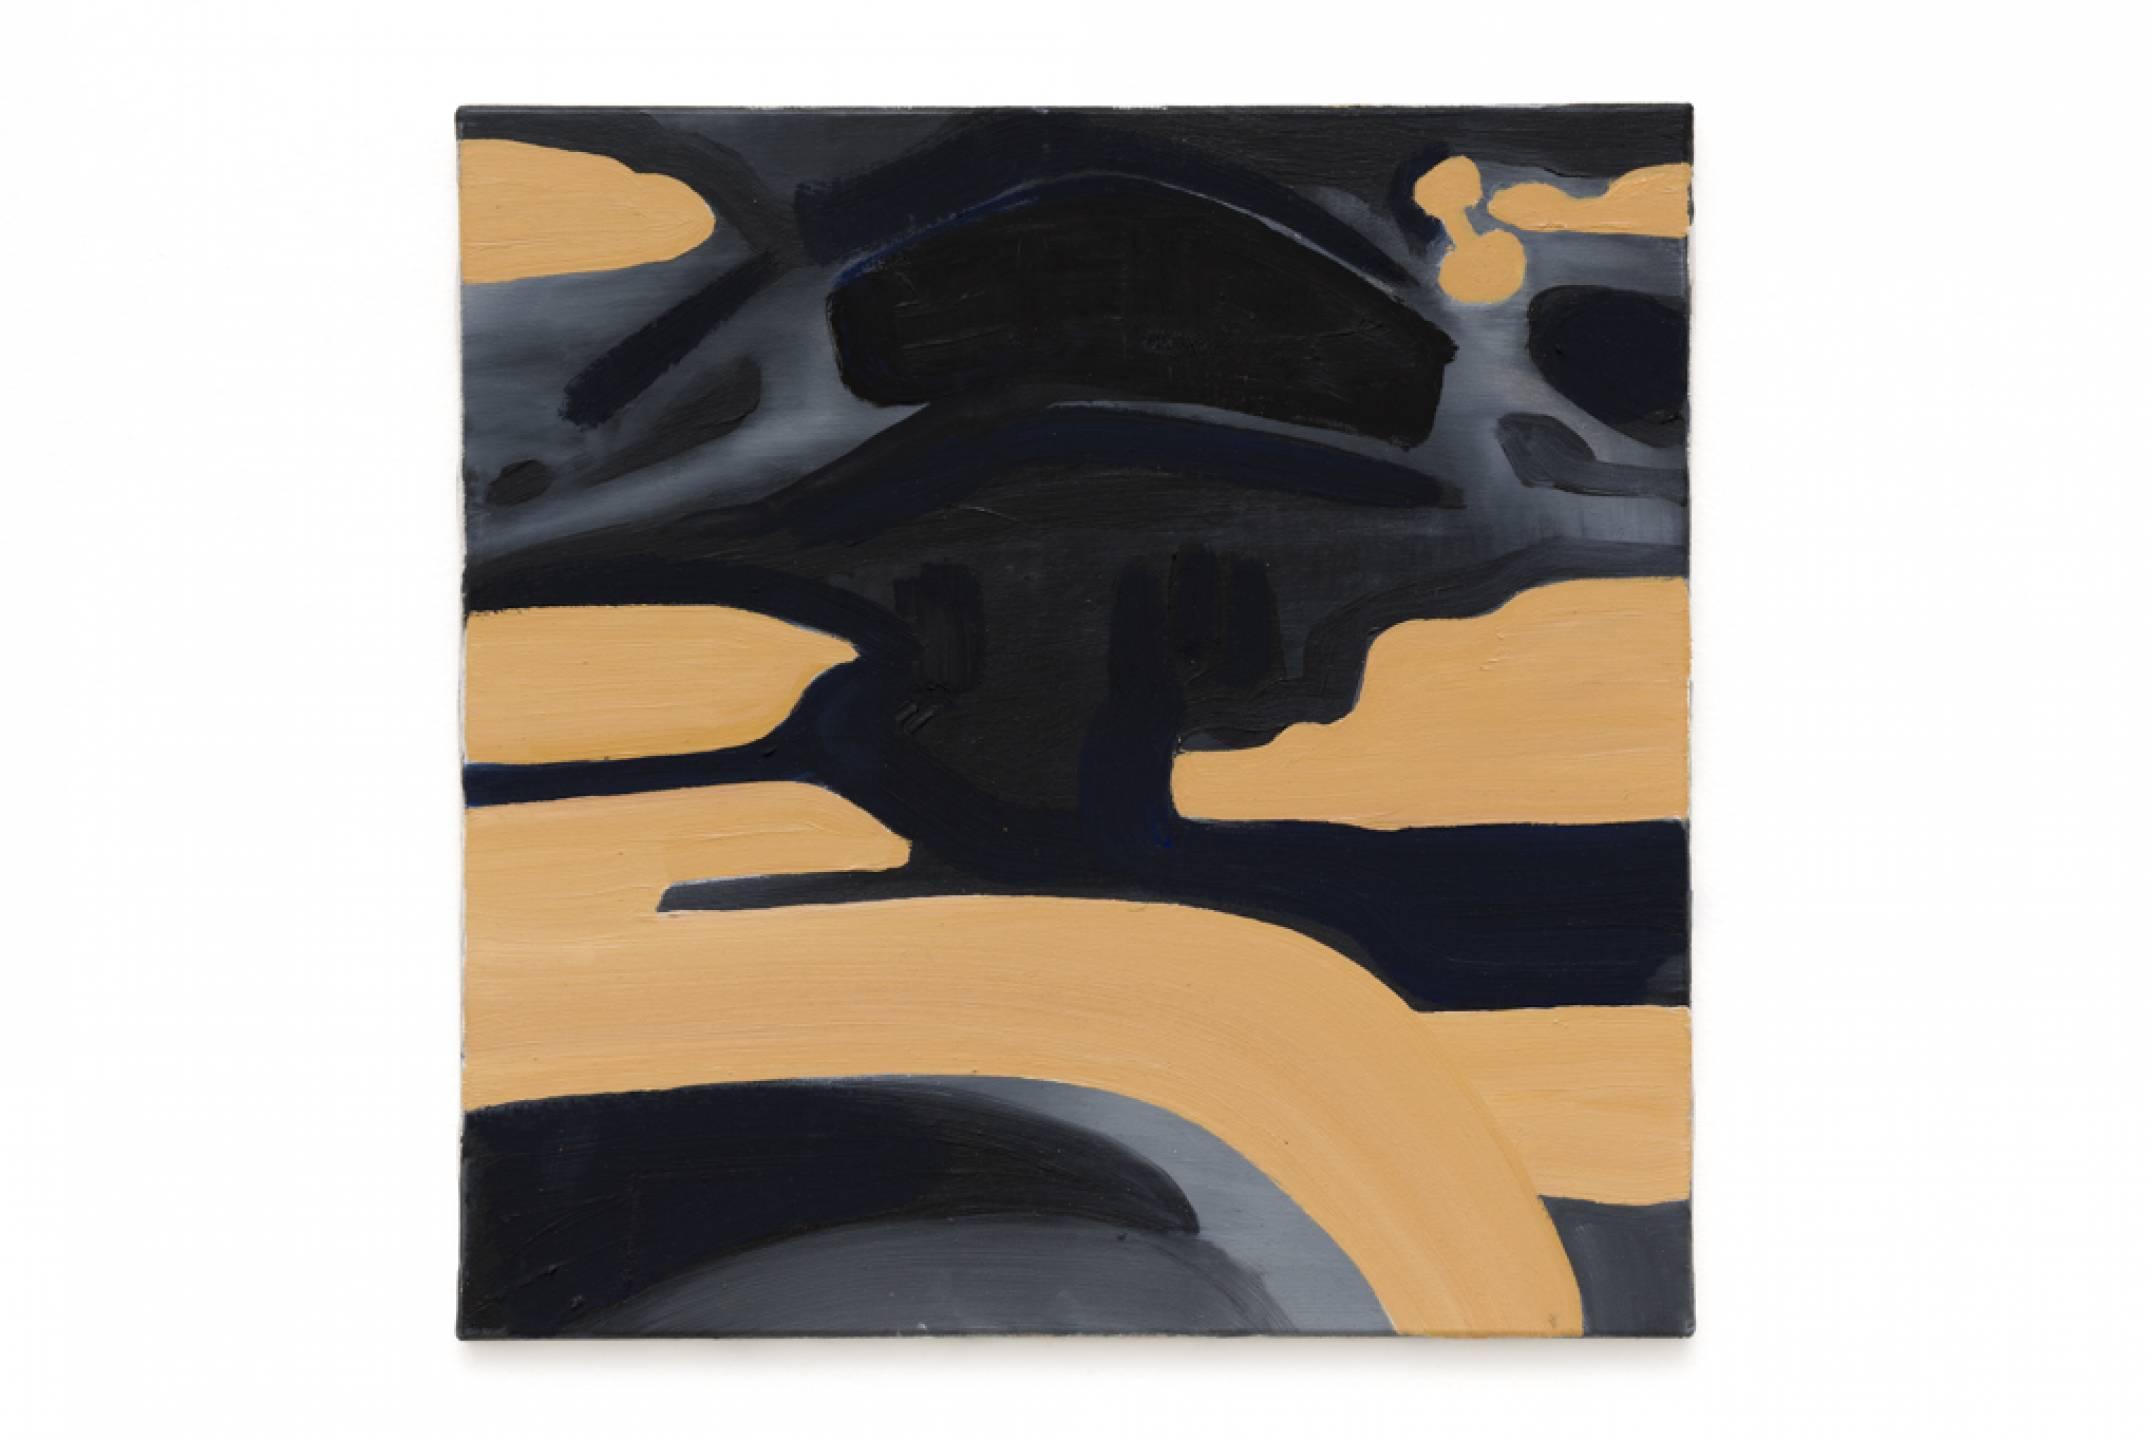 Marina Perez Simão,&nbsp;<em>untitled</em>,&nbsp;2017,&nbsp;oil on canvas, 40 × 40 cm - Mendes Wood DM